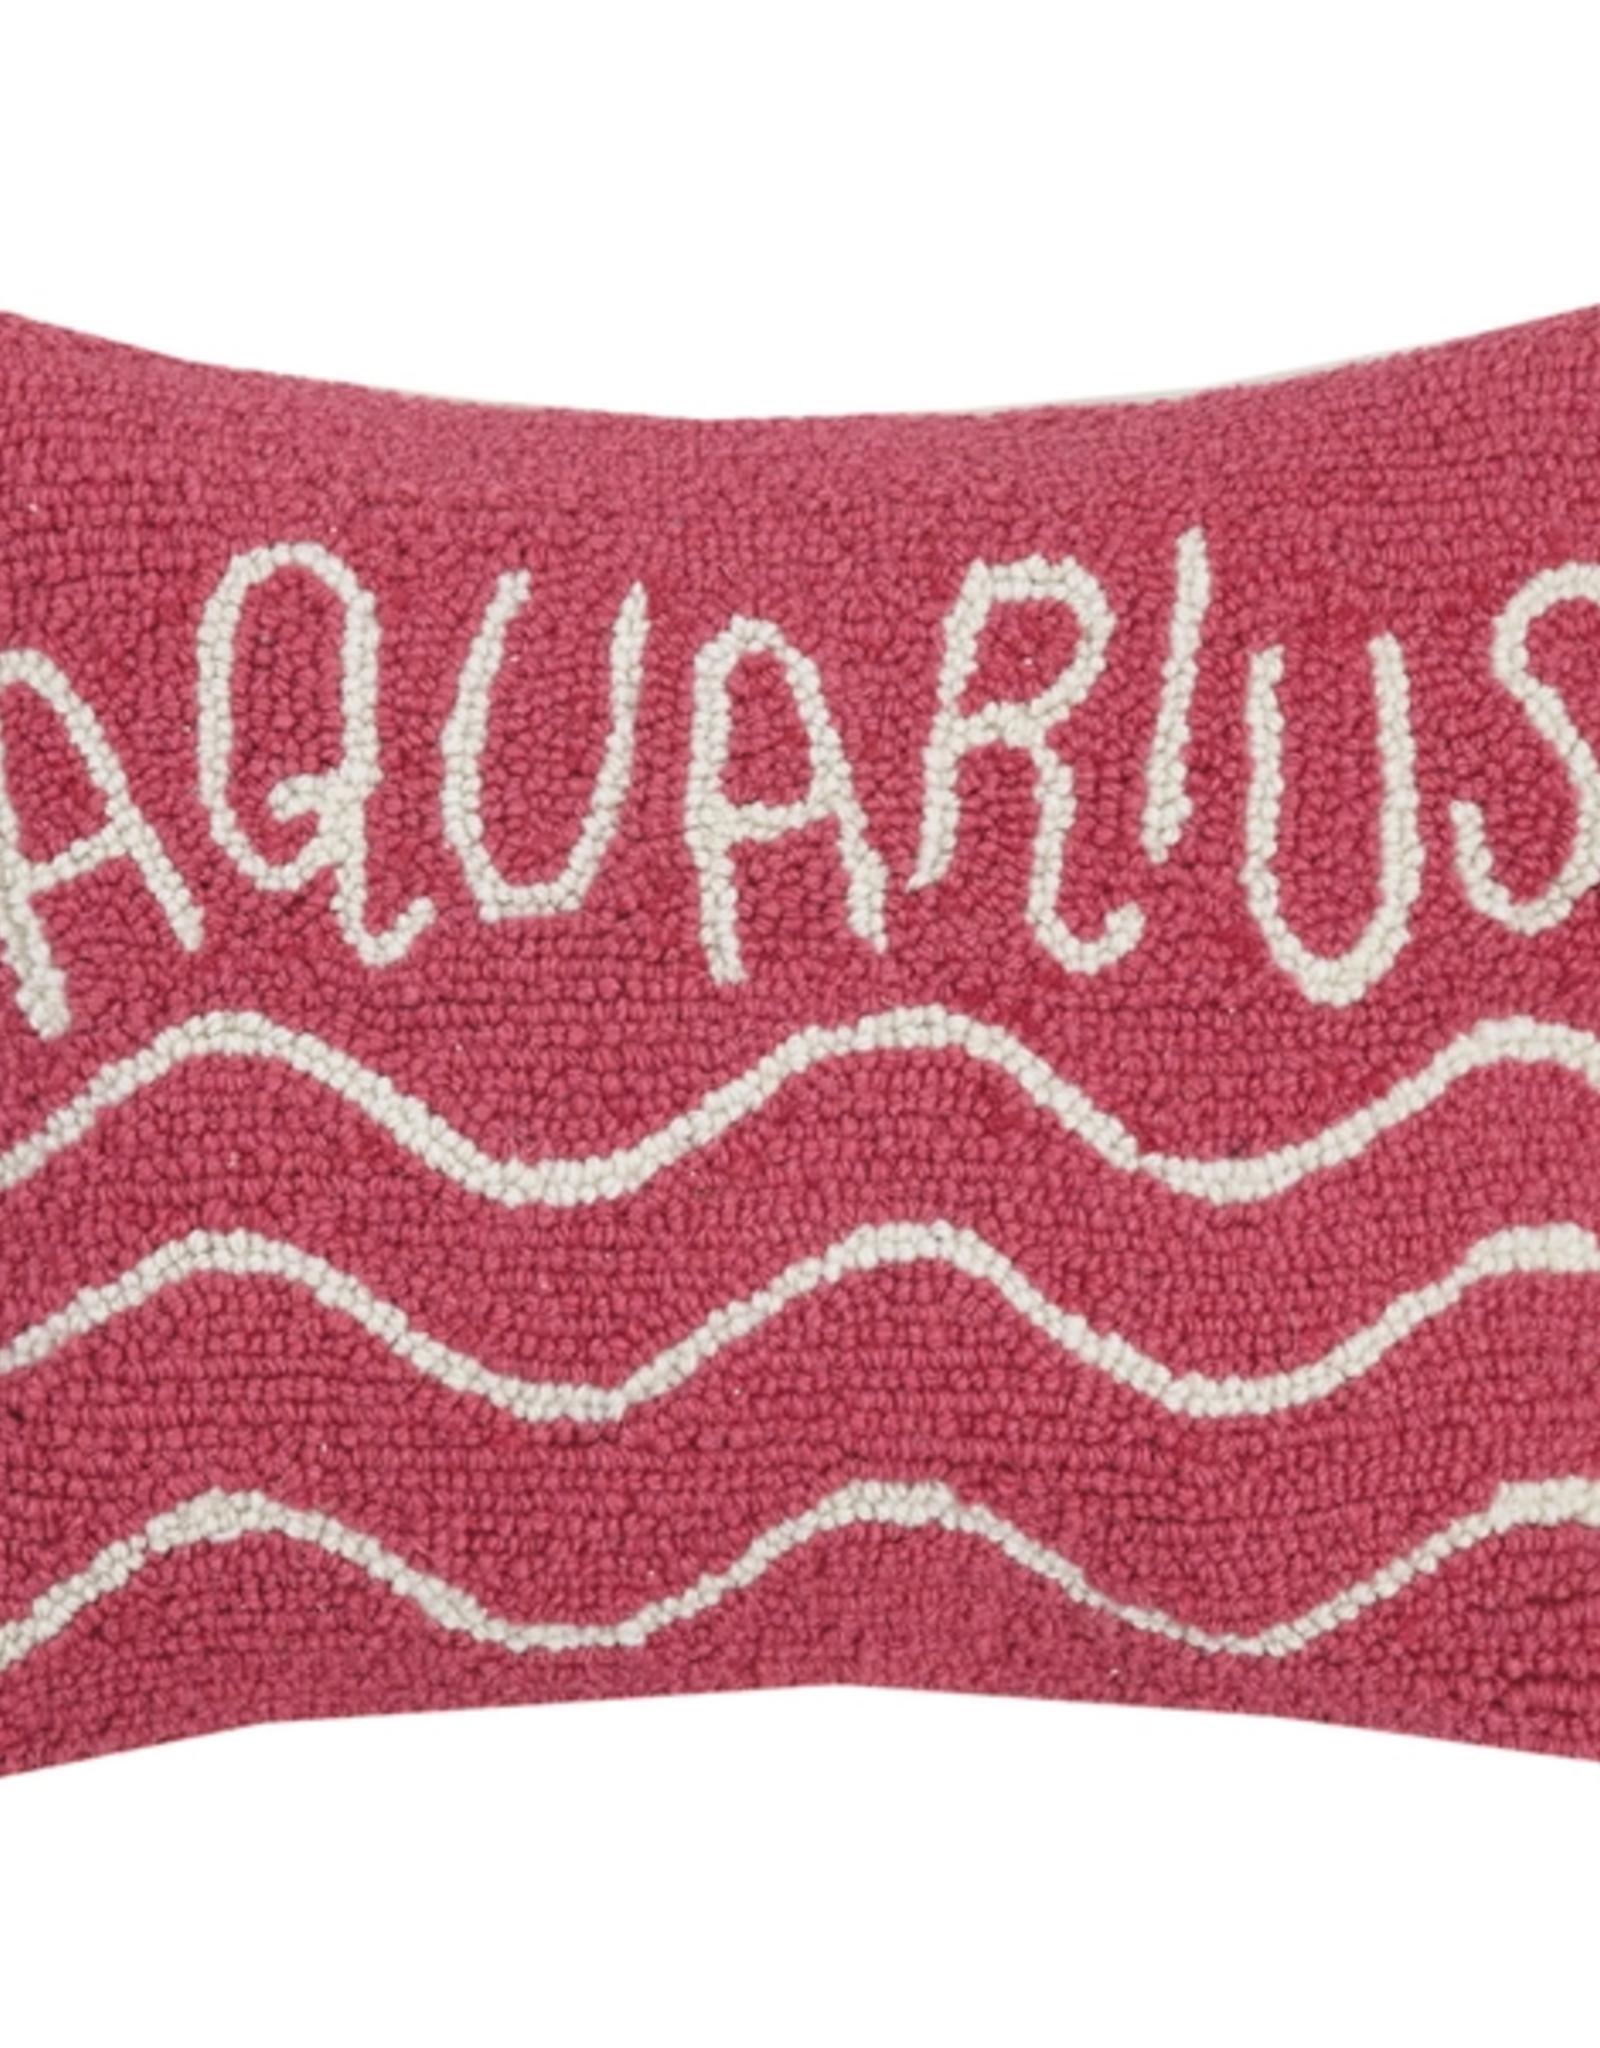 Peking Handicraft Aquarius Throw Hook Pillow